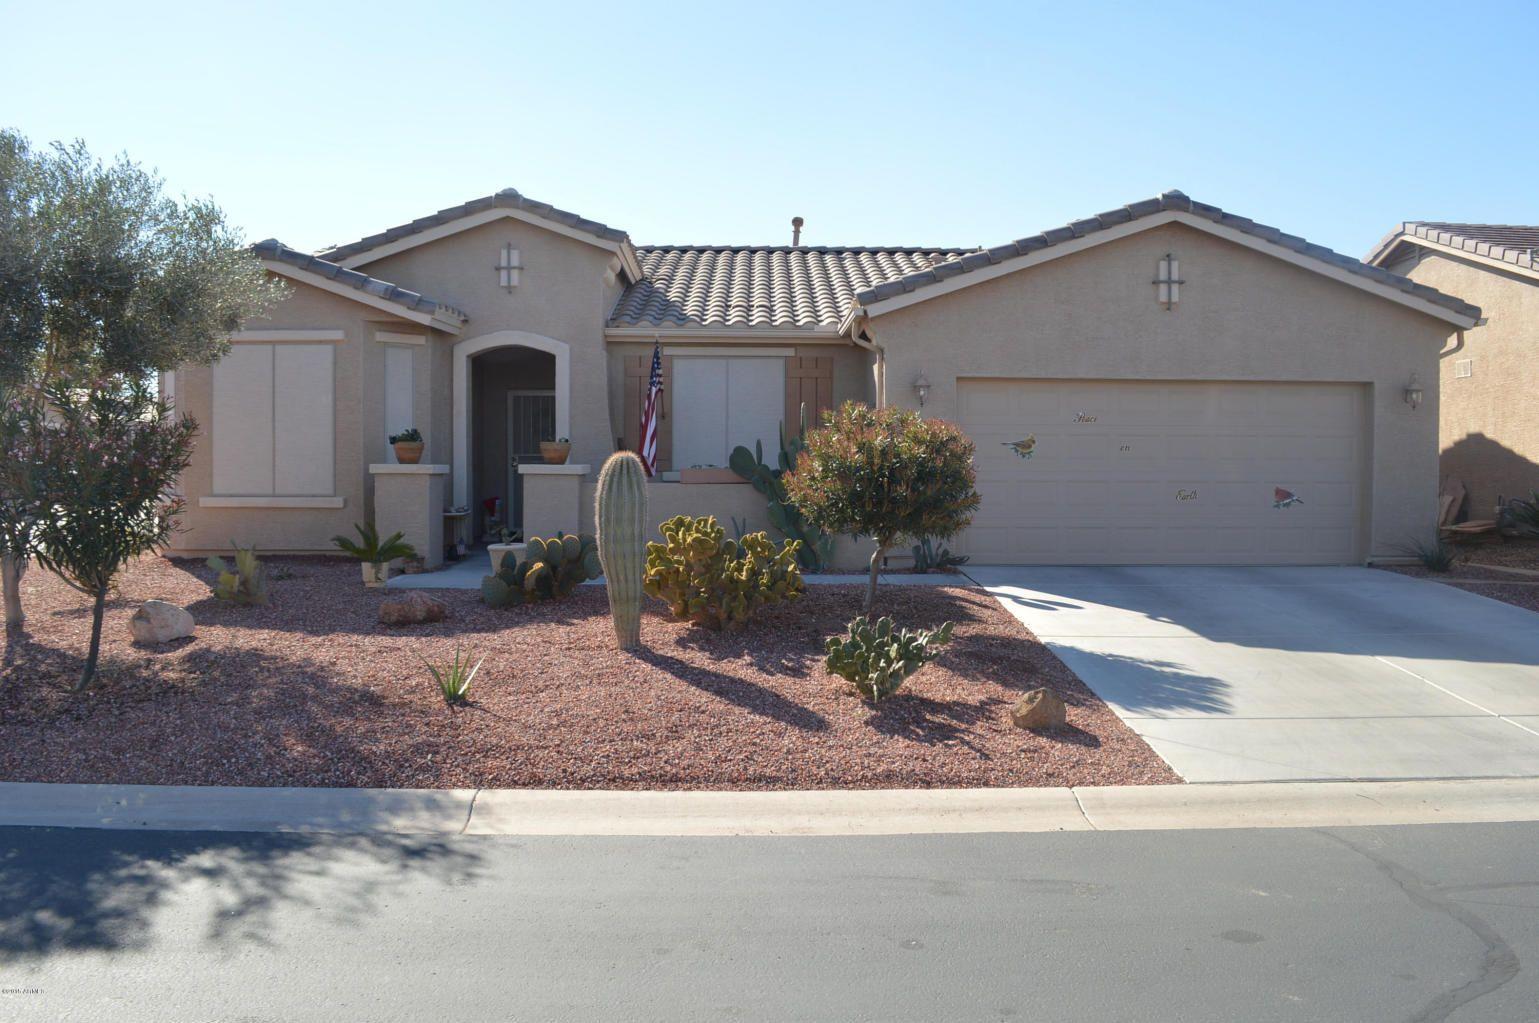 Mls 5216110 Flexmls Mobile Winter House Real Estate Outdoor Decor